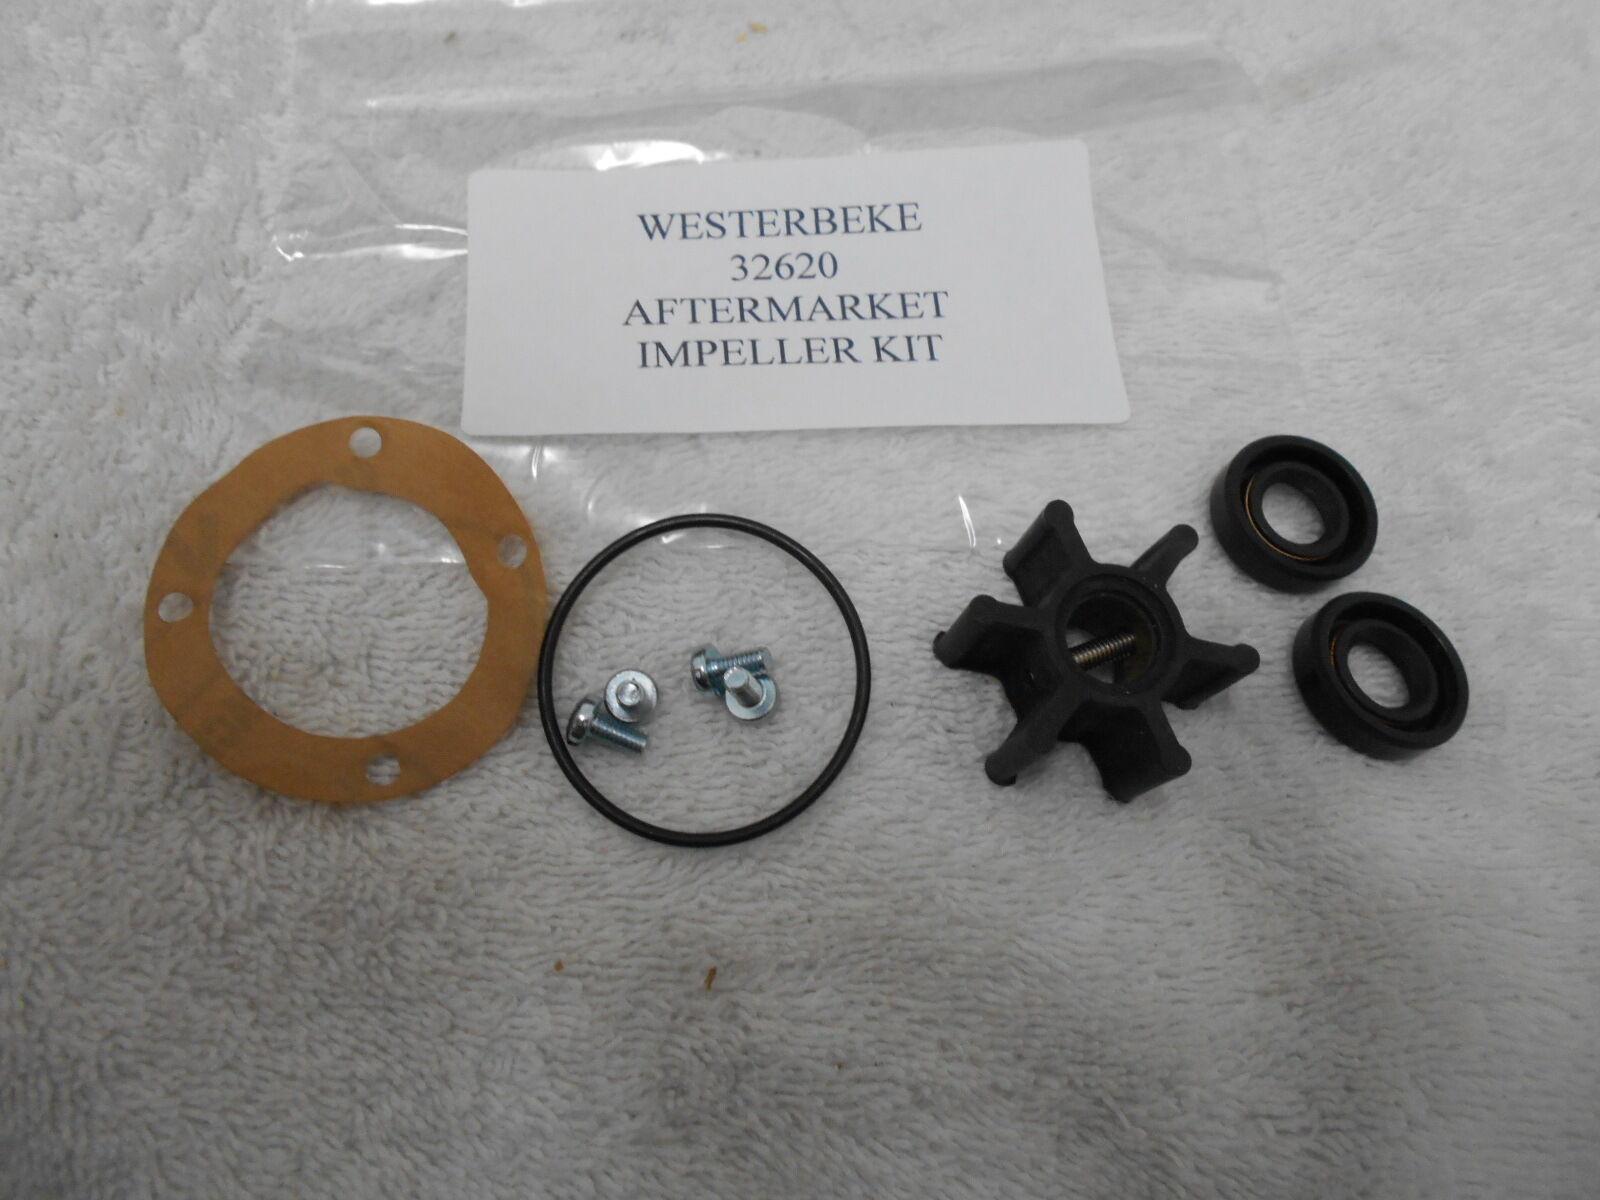 new Westerbeke Generator RAW WATER PUMP  Impeller Kit - 32620